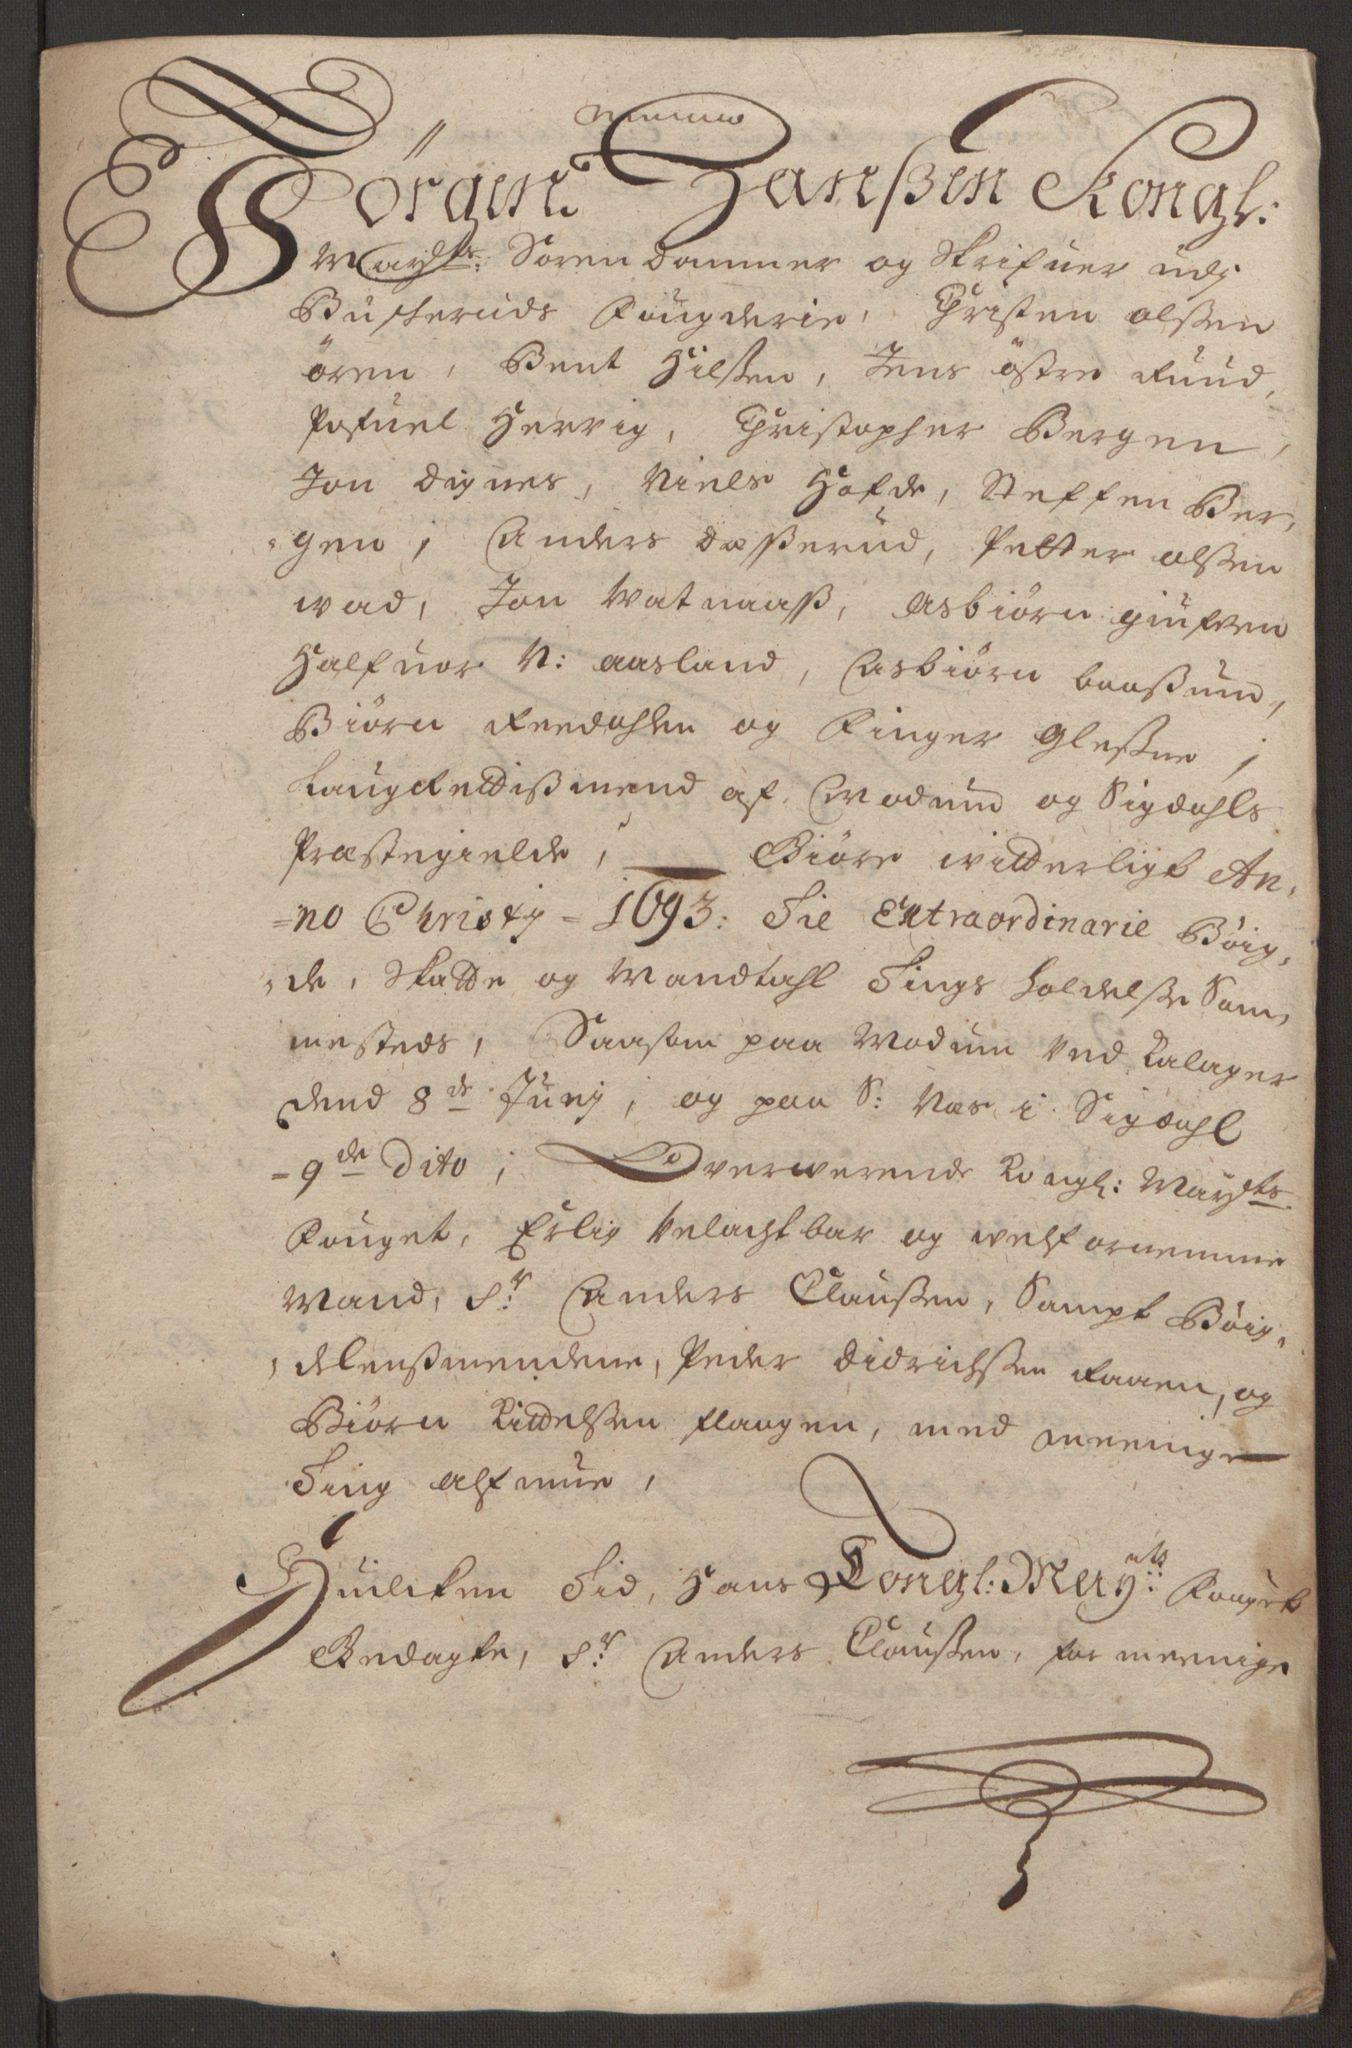 RA, Rentekammeret inntil 1814, Reviderte regnskaper, Fogderegnskap, R25/L1682: Fogderegnskap Buskerud, 1693, s. 199